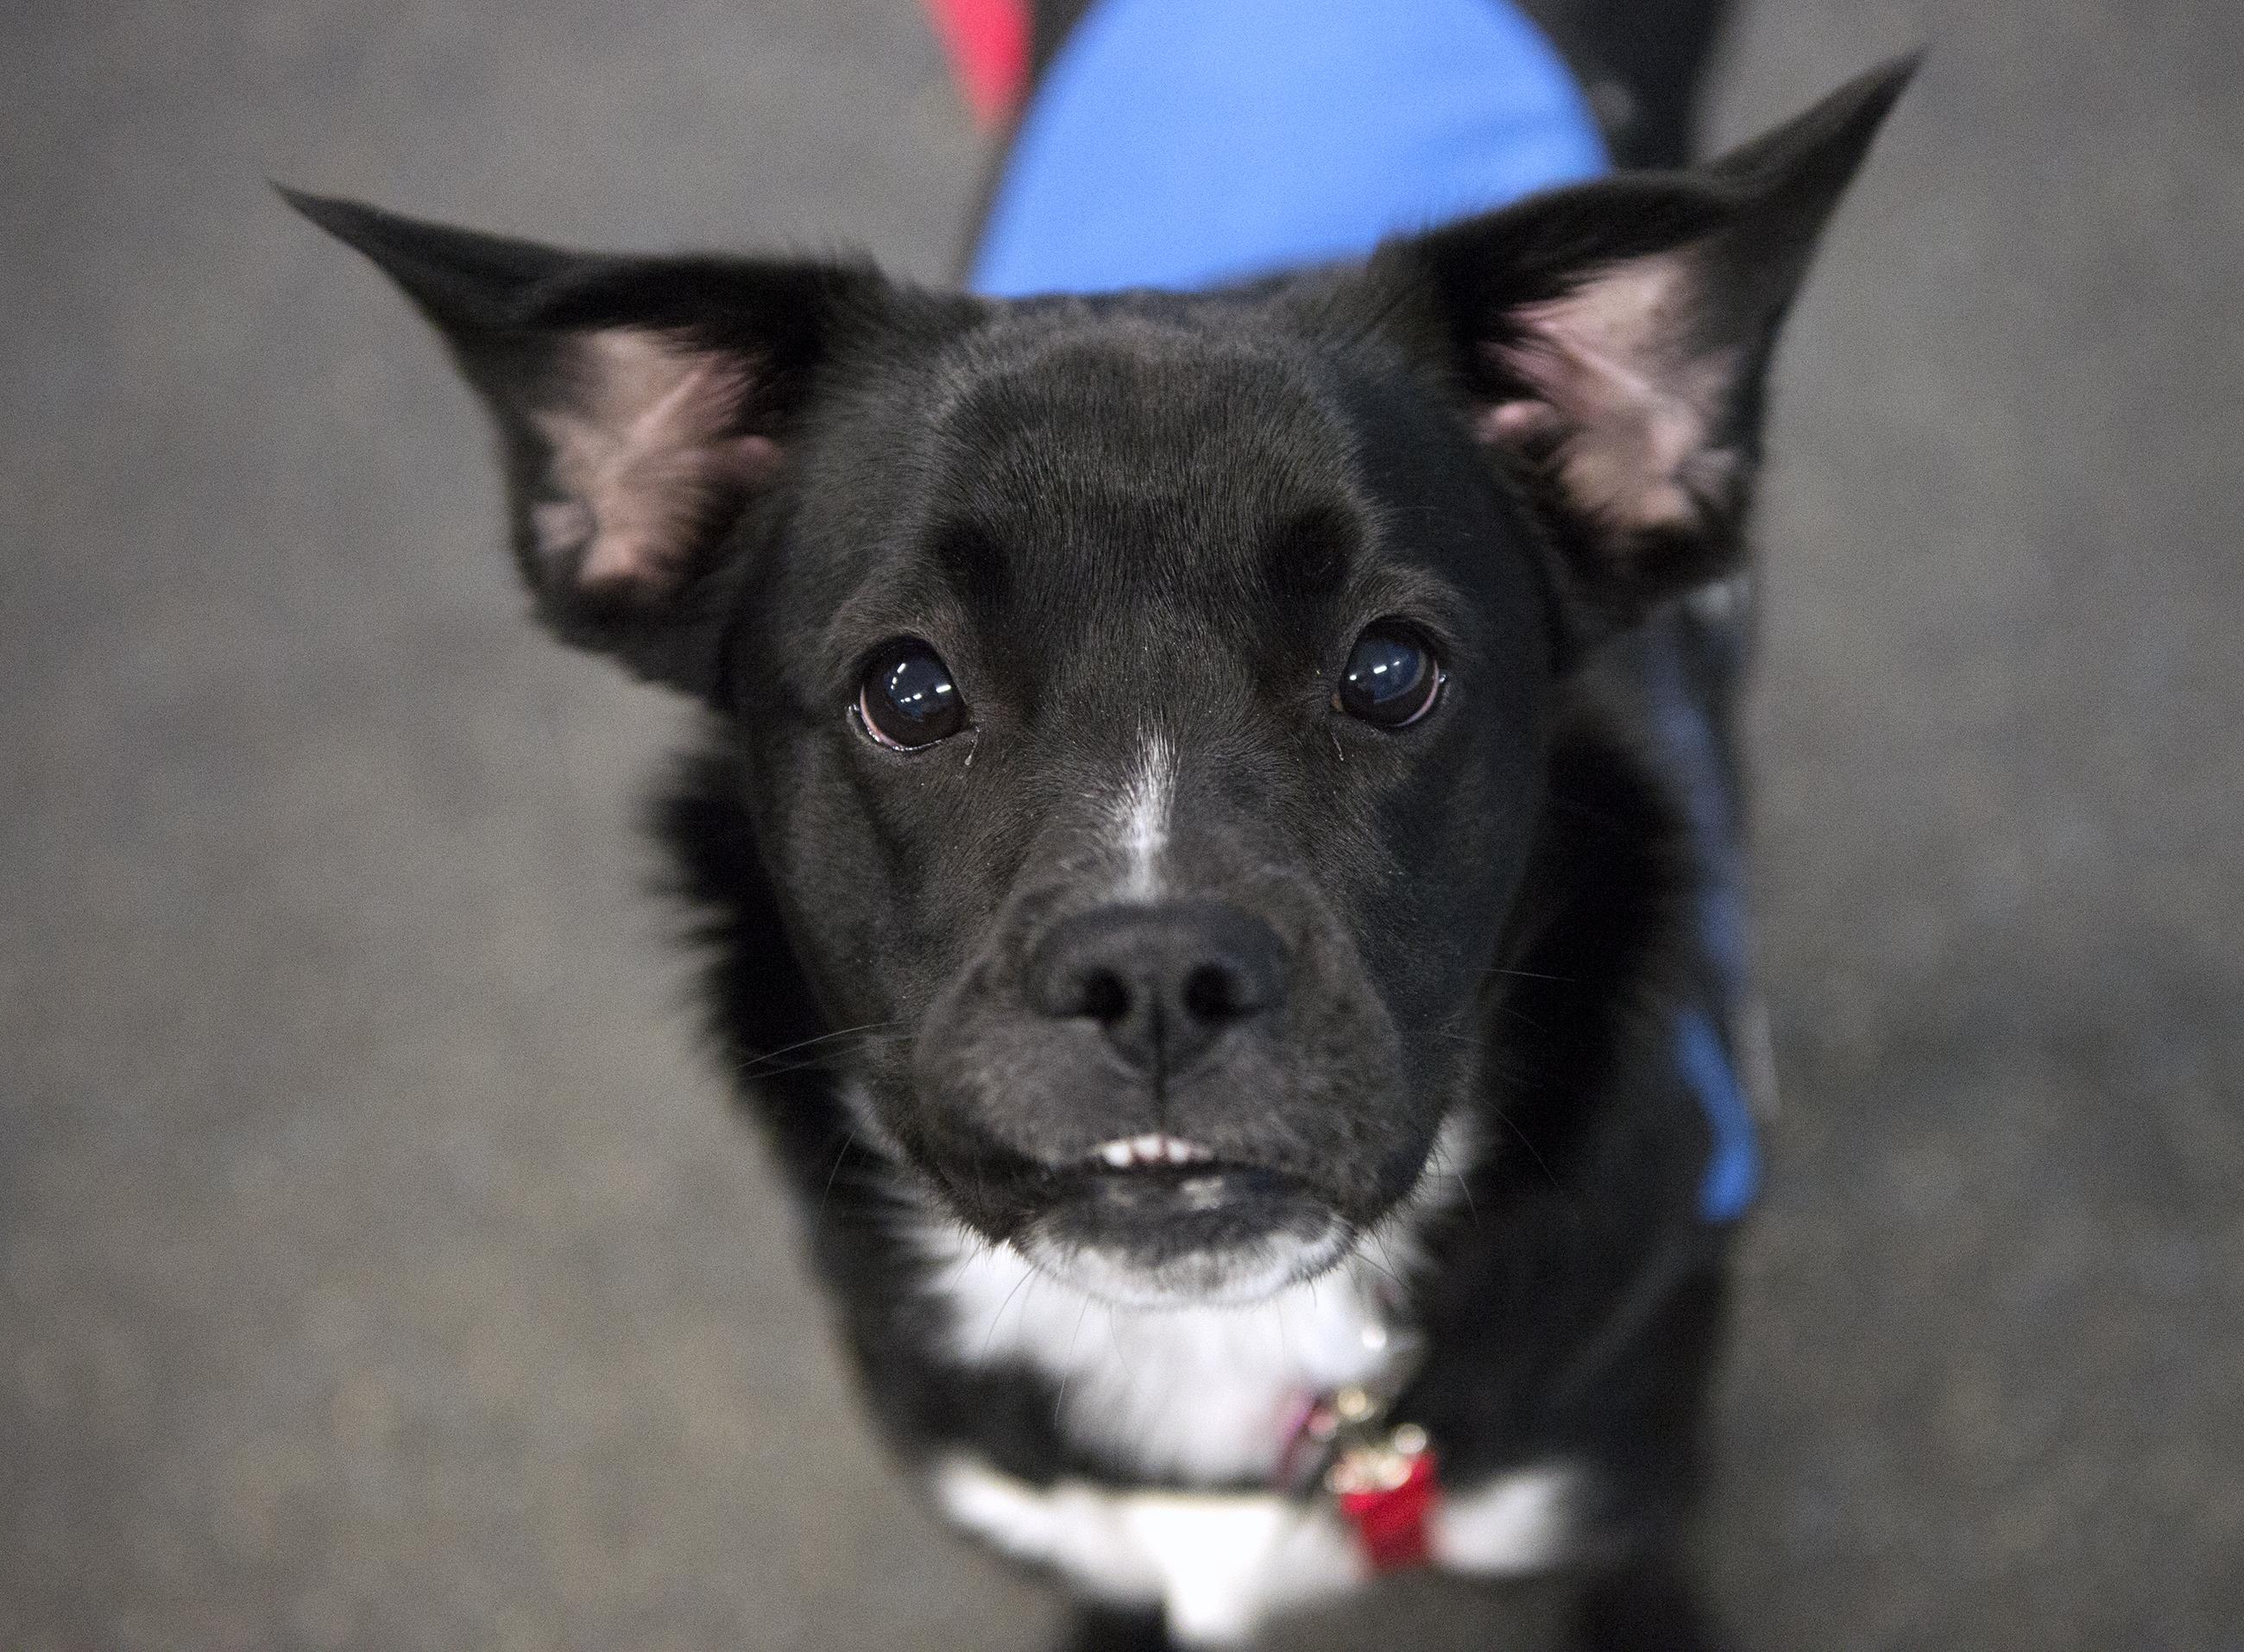 20171220hnRaisin-1 Raisin, the first graduate of Canine Service Pals, has a slight underbite.